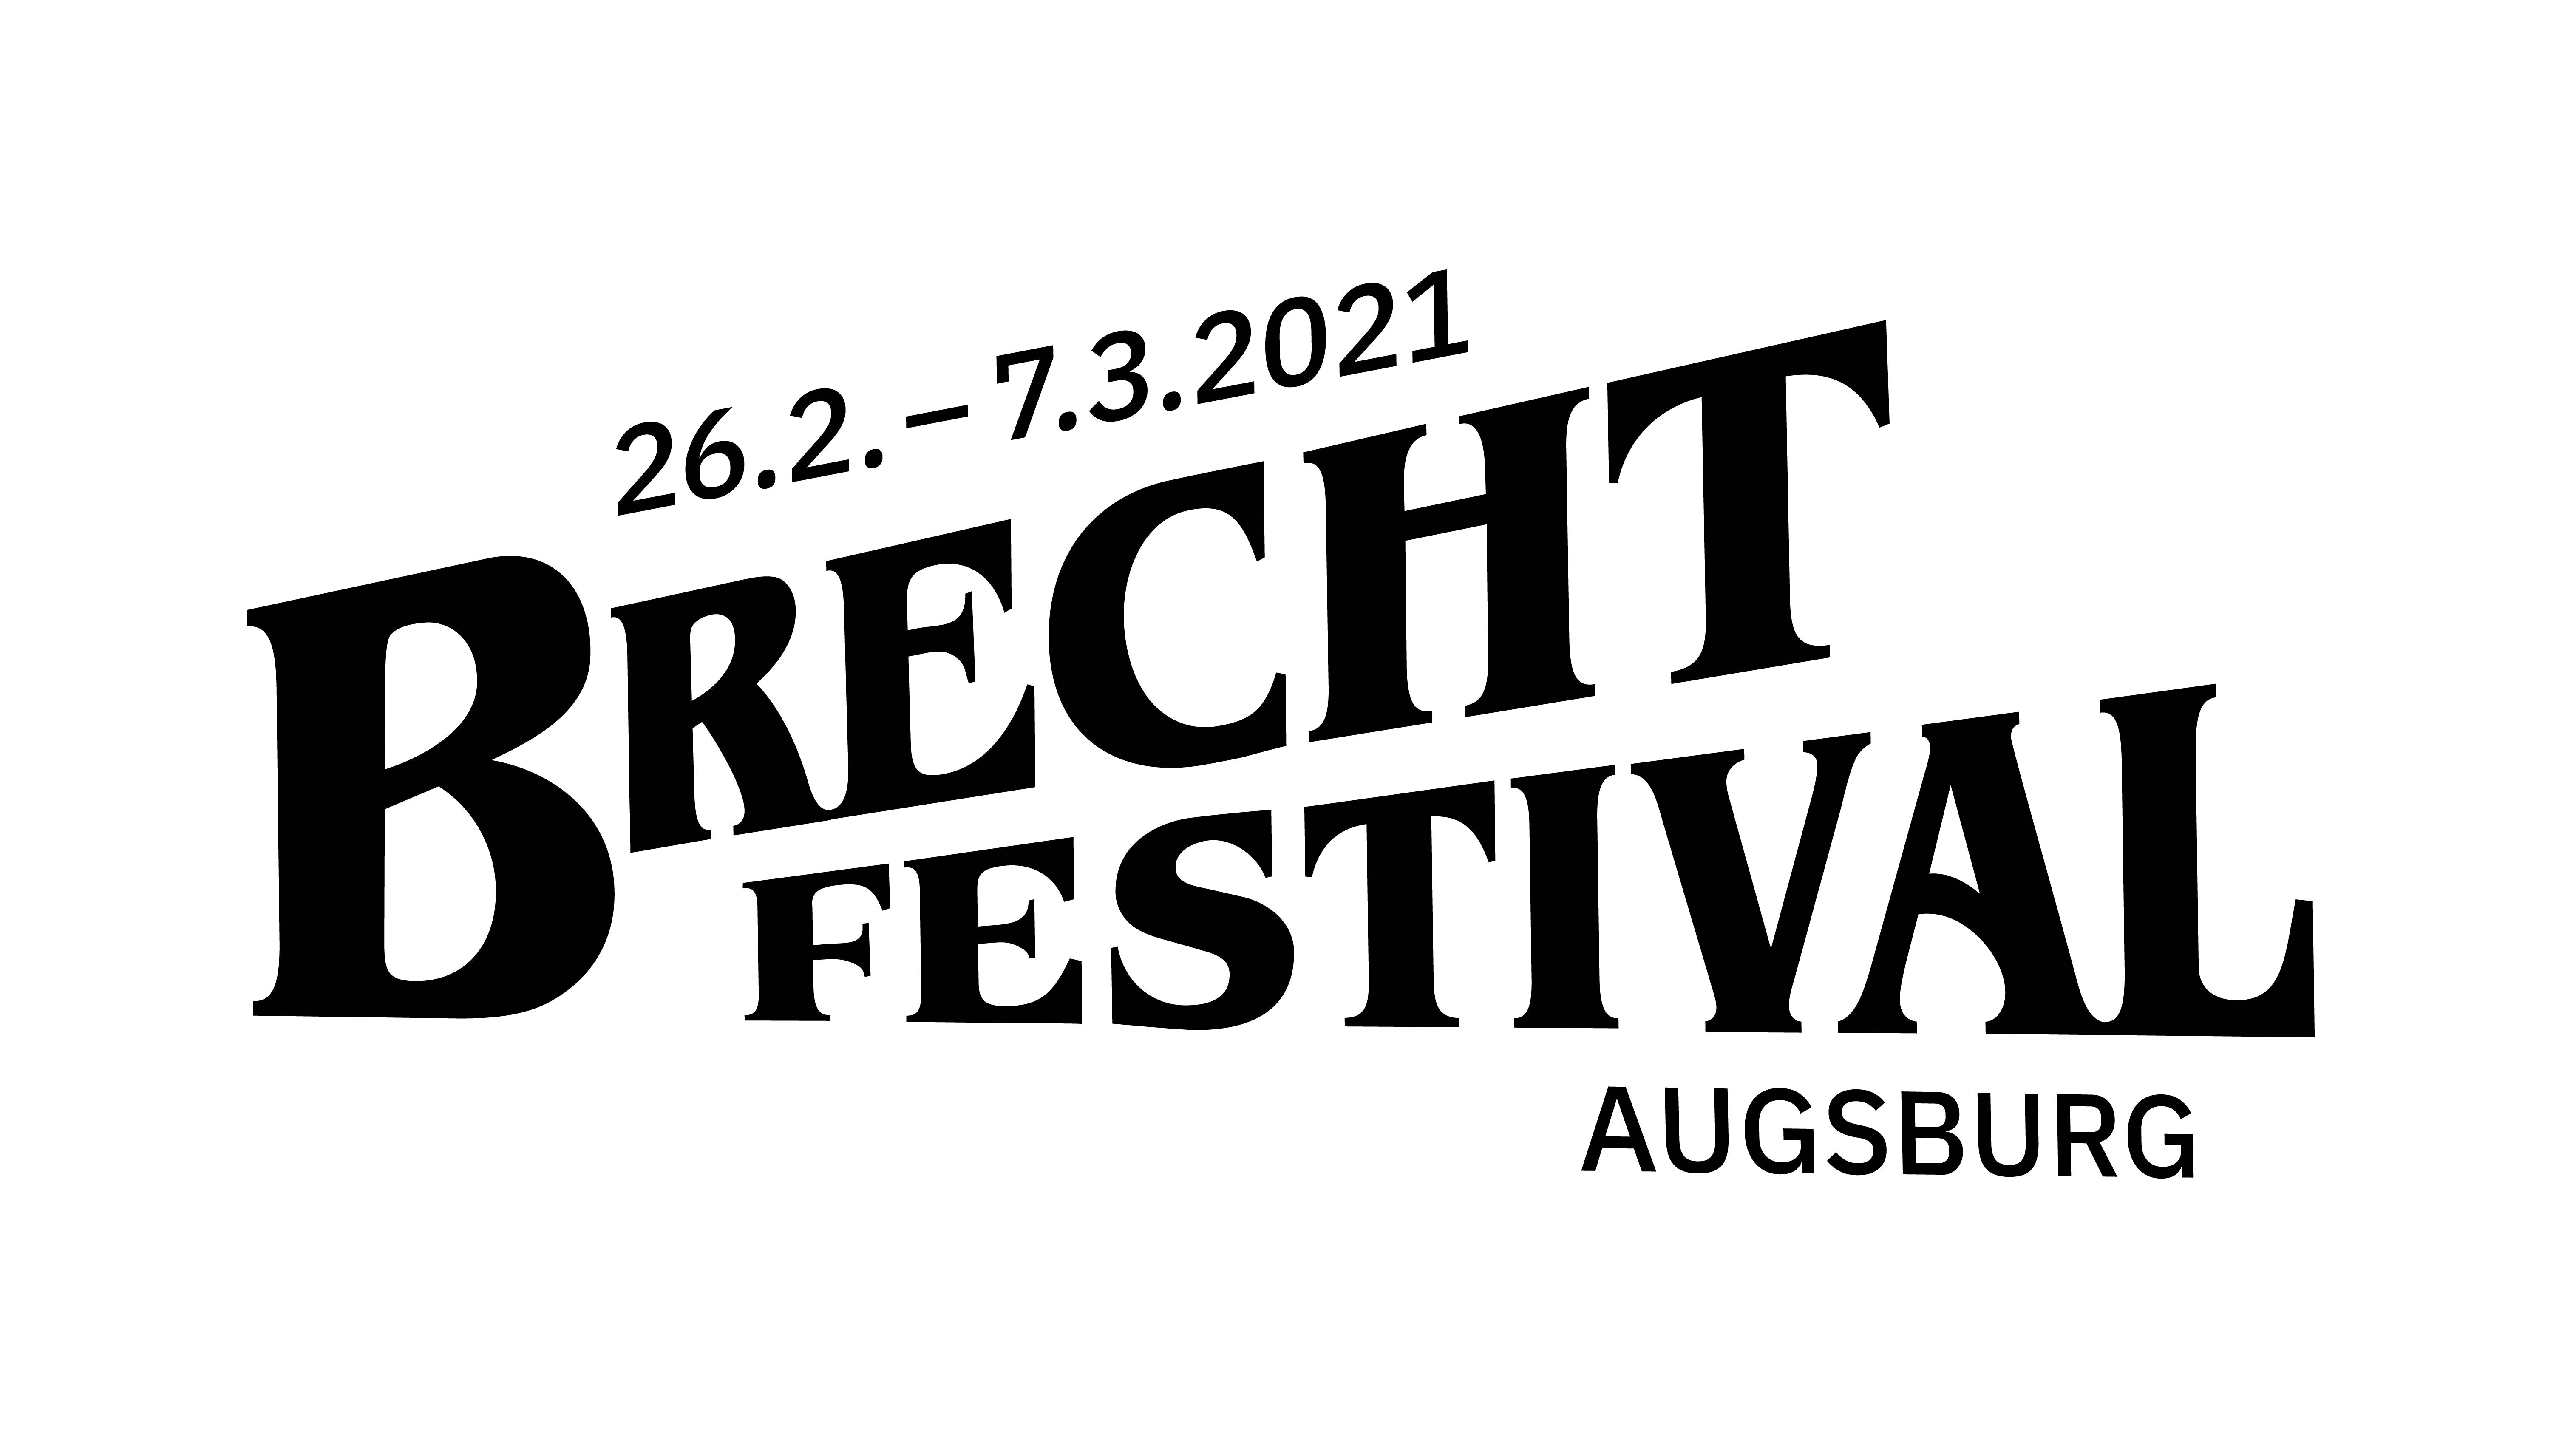 brecht-festival-logo